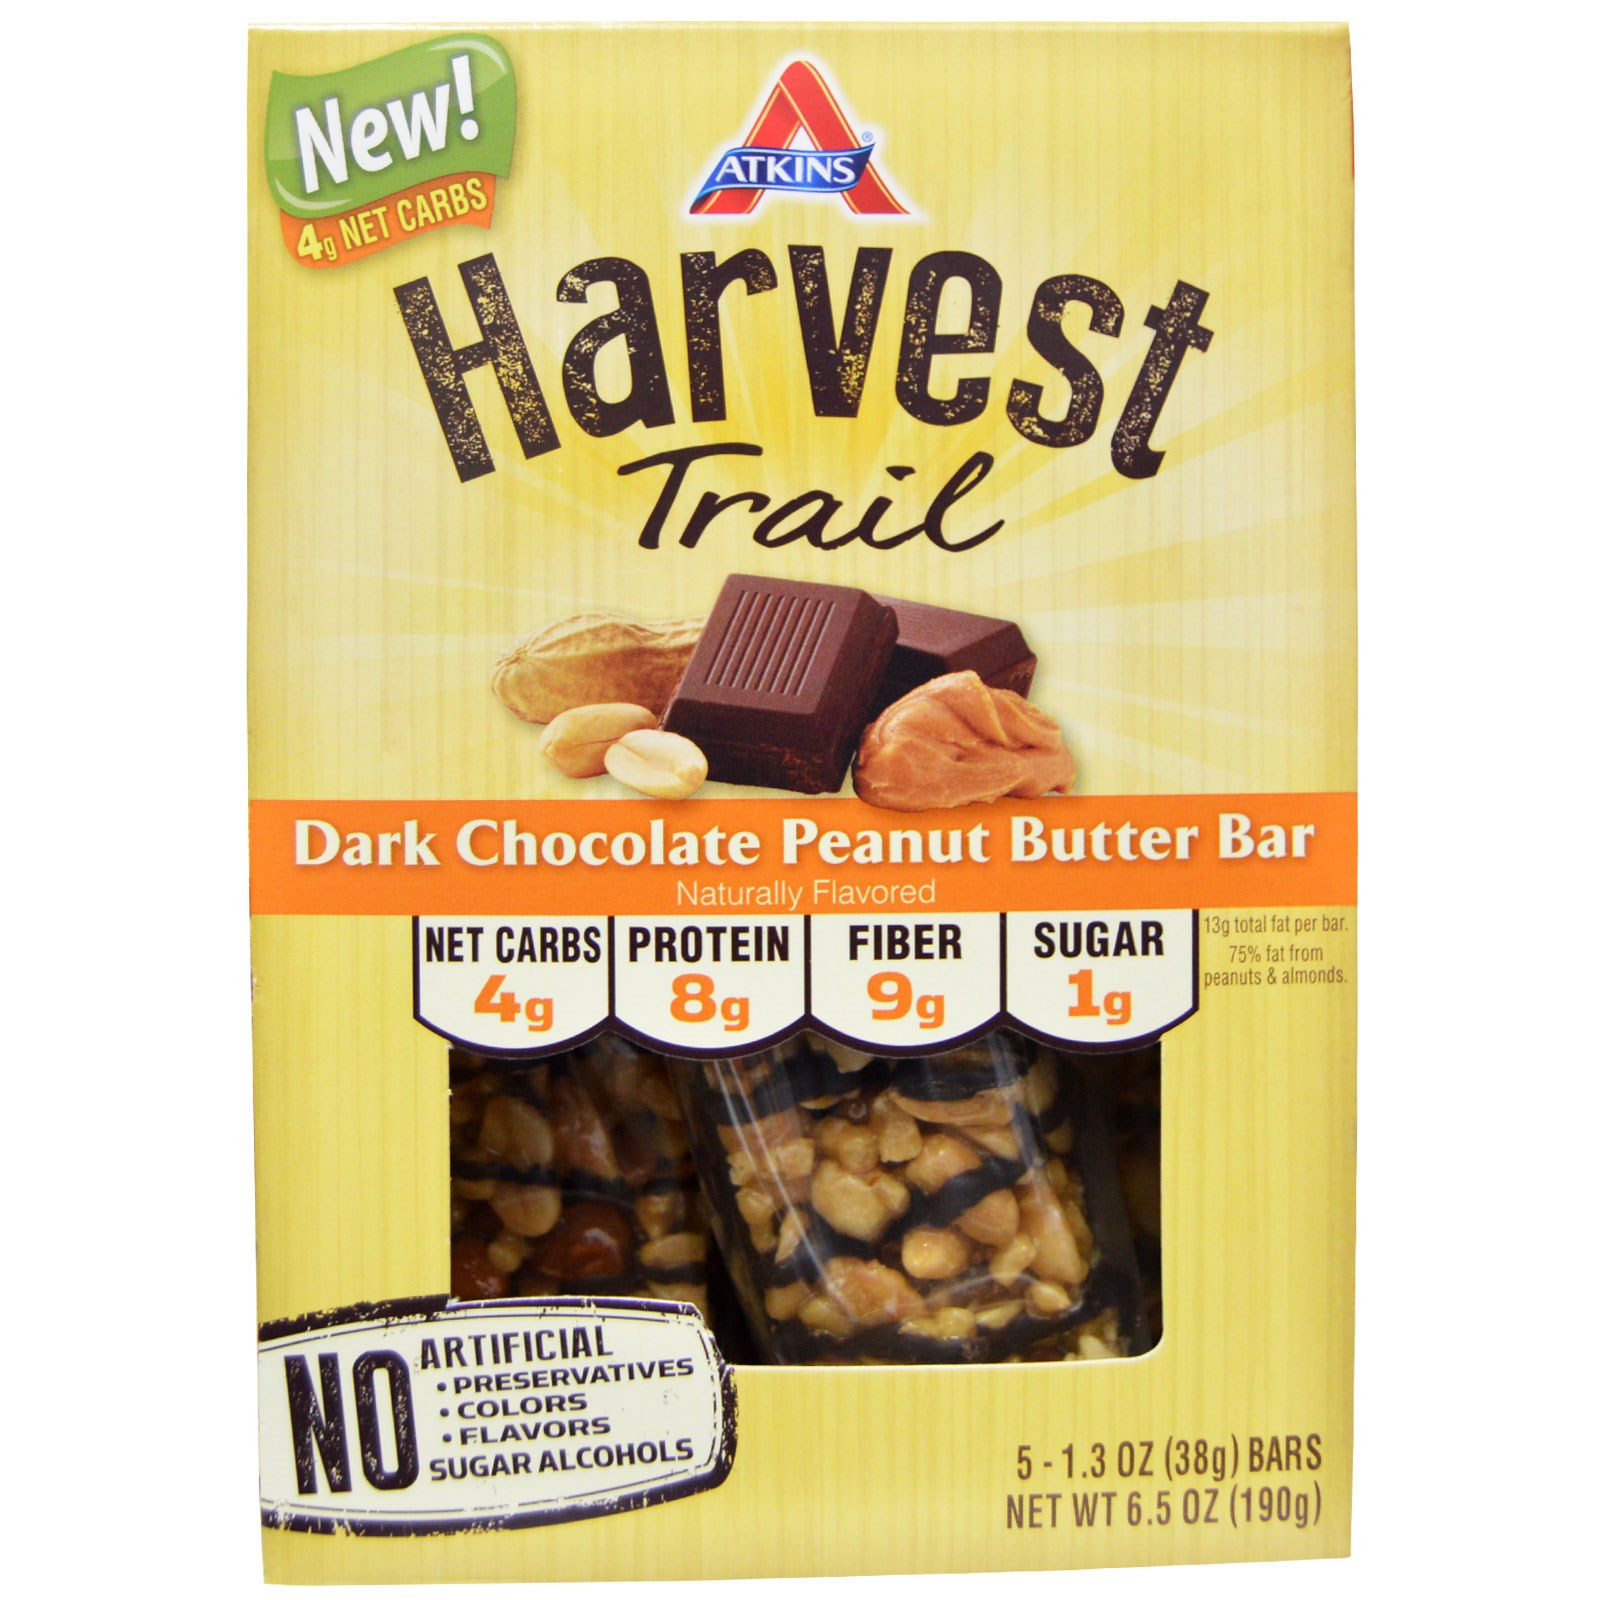 Atkins, Harvest Trail, Dark Chocolate Peanut Butter Bars, 5 packs, 1.3 oz (38 g) Each